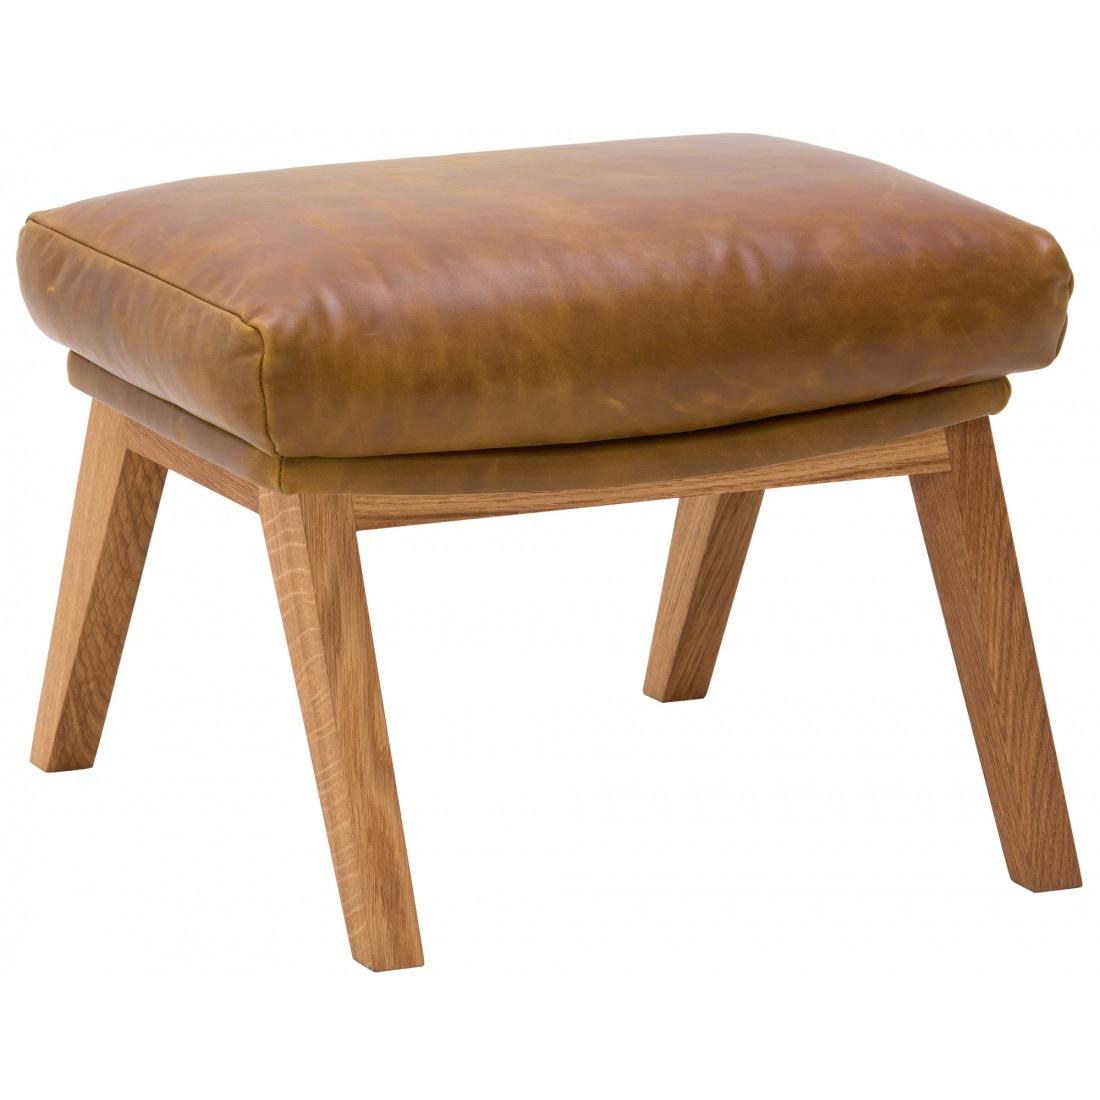 Hocker Hellbraun Sitzhocker Sitzwürfel Moebel Liebecom